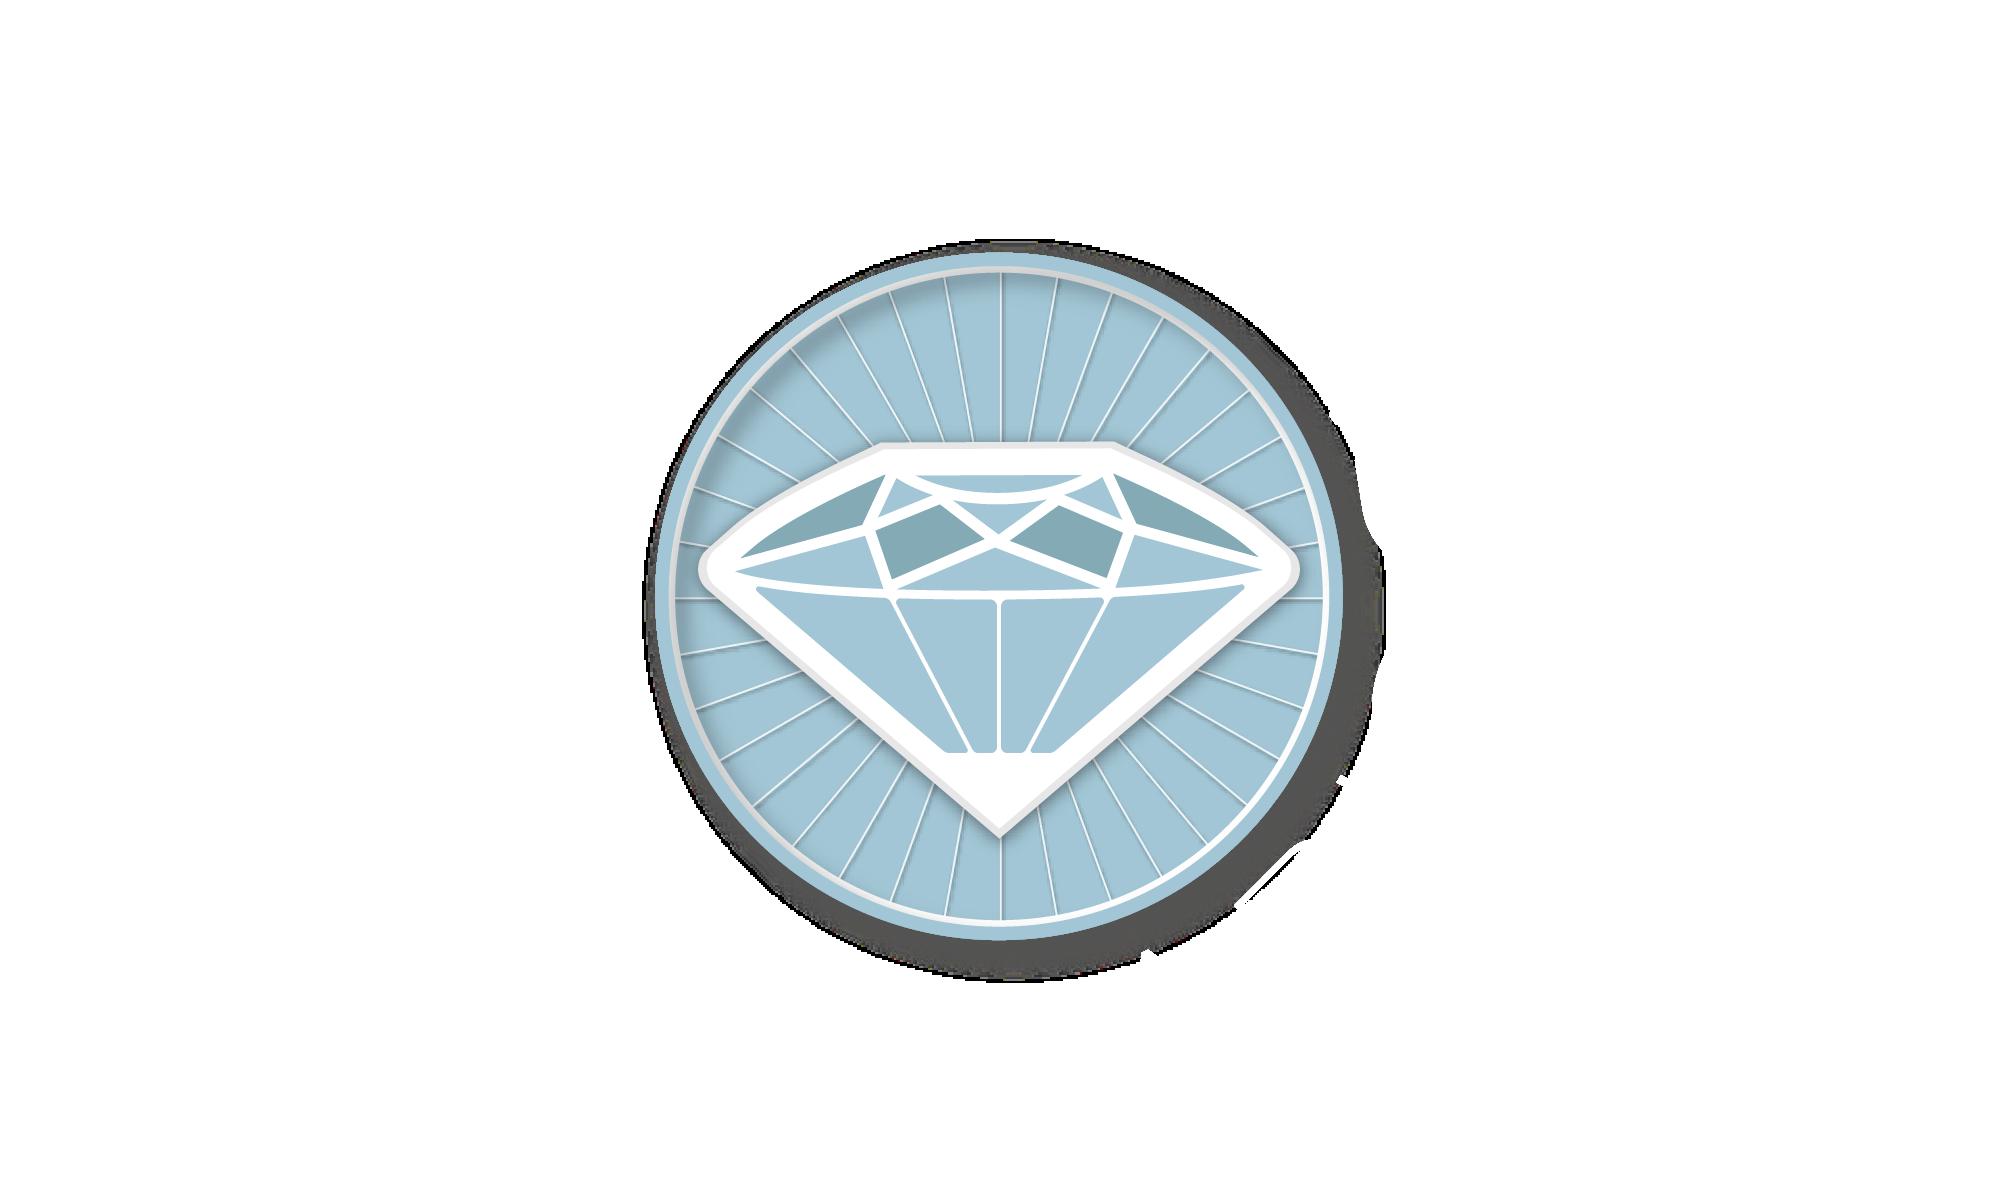 Diamond Cannabis - Dispensary in Grants Pass, Oregon